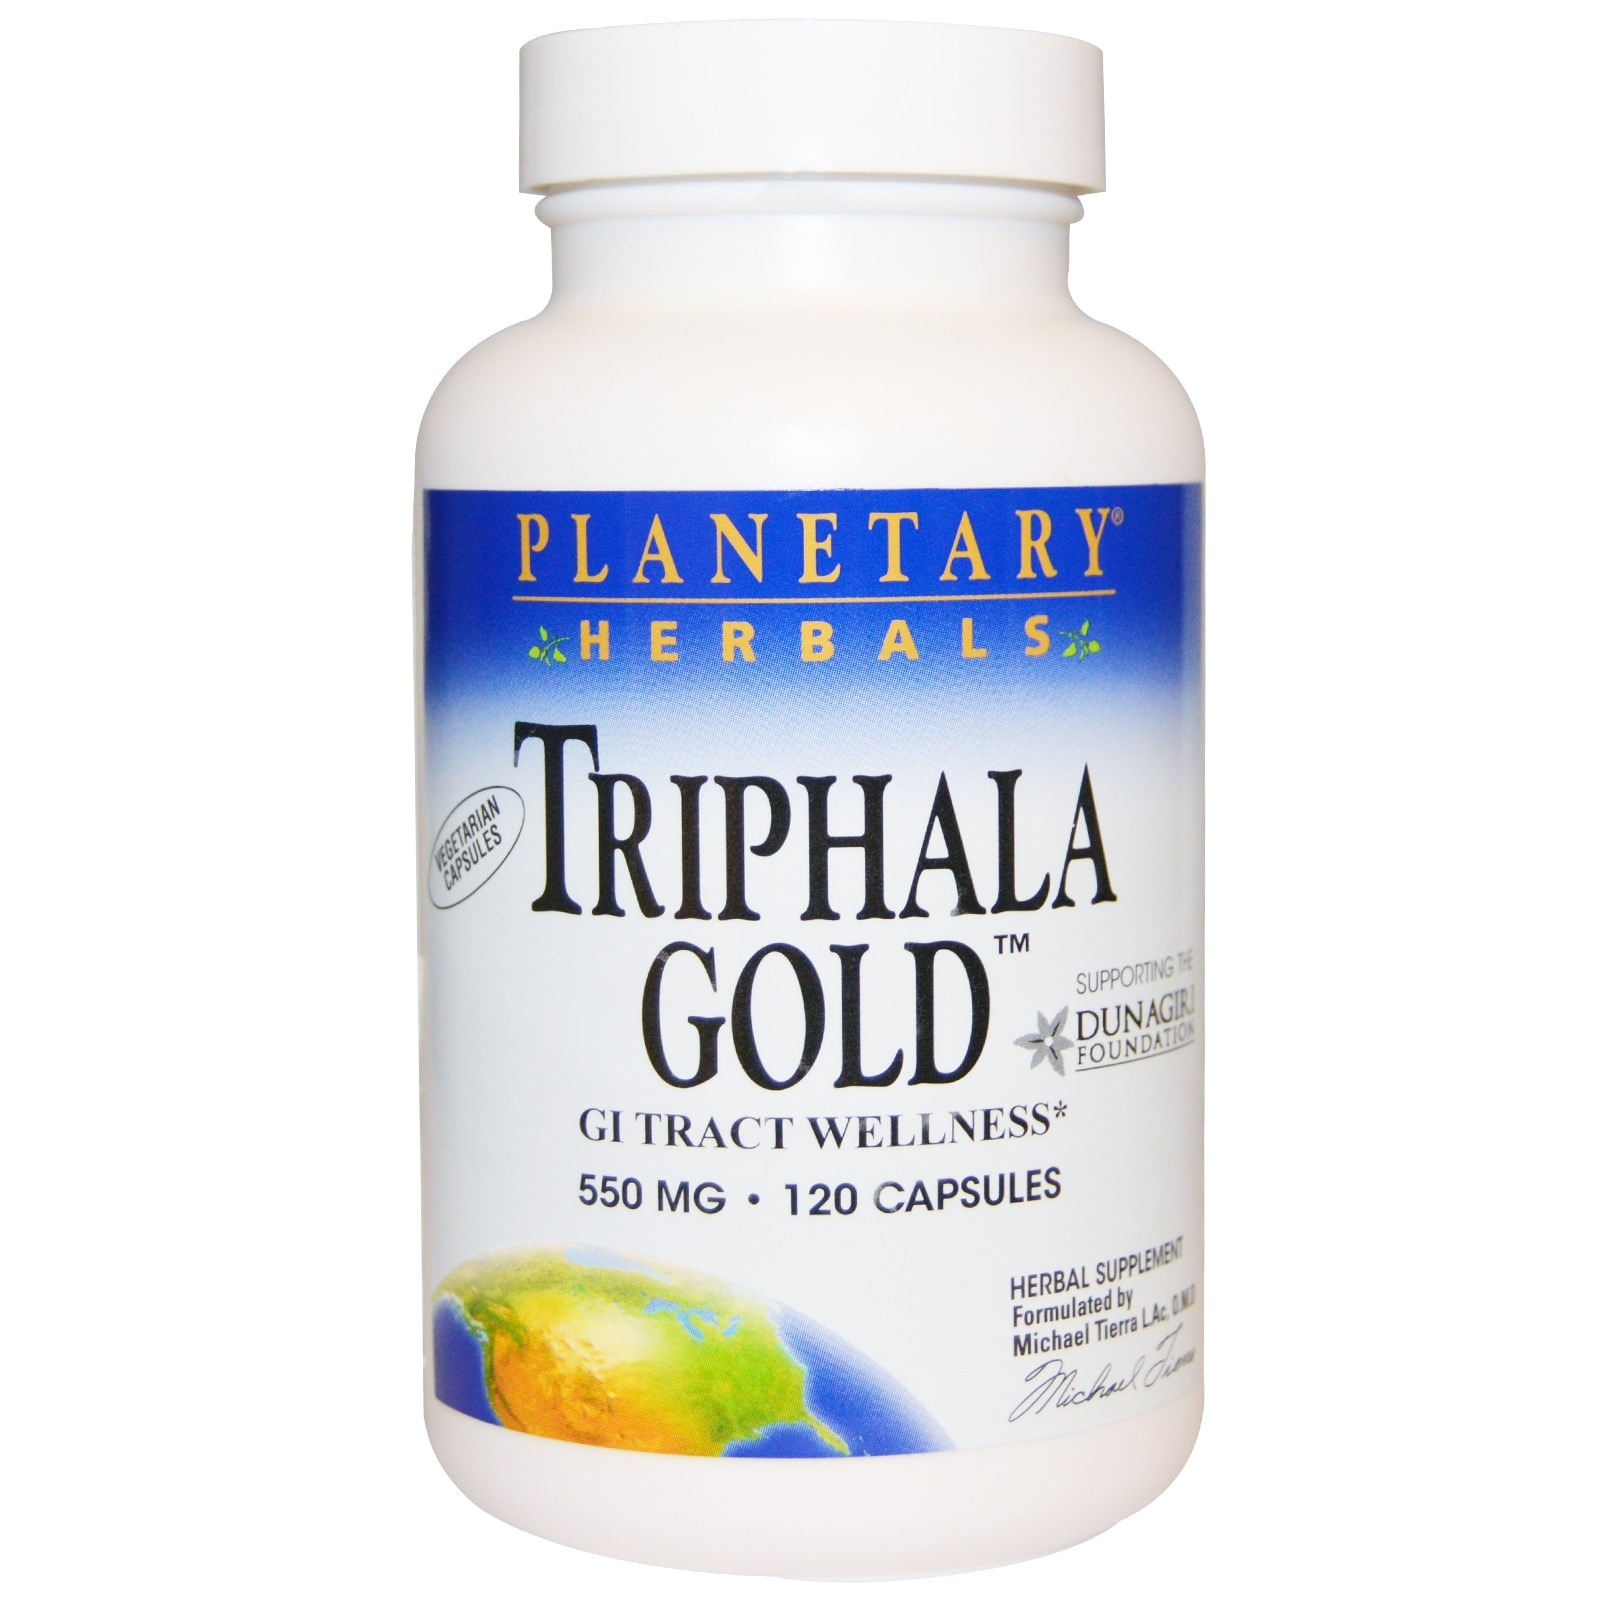 Трифала Голд, здоровье желудочно-кишечного тракта, 550 мг, 120 капсул от Planetary Herbals на сайте iHerb